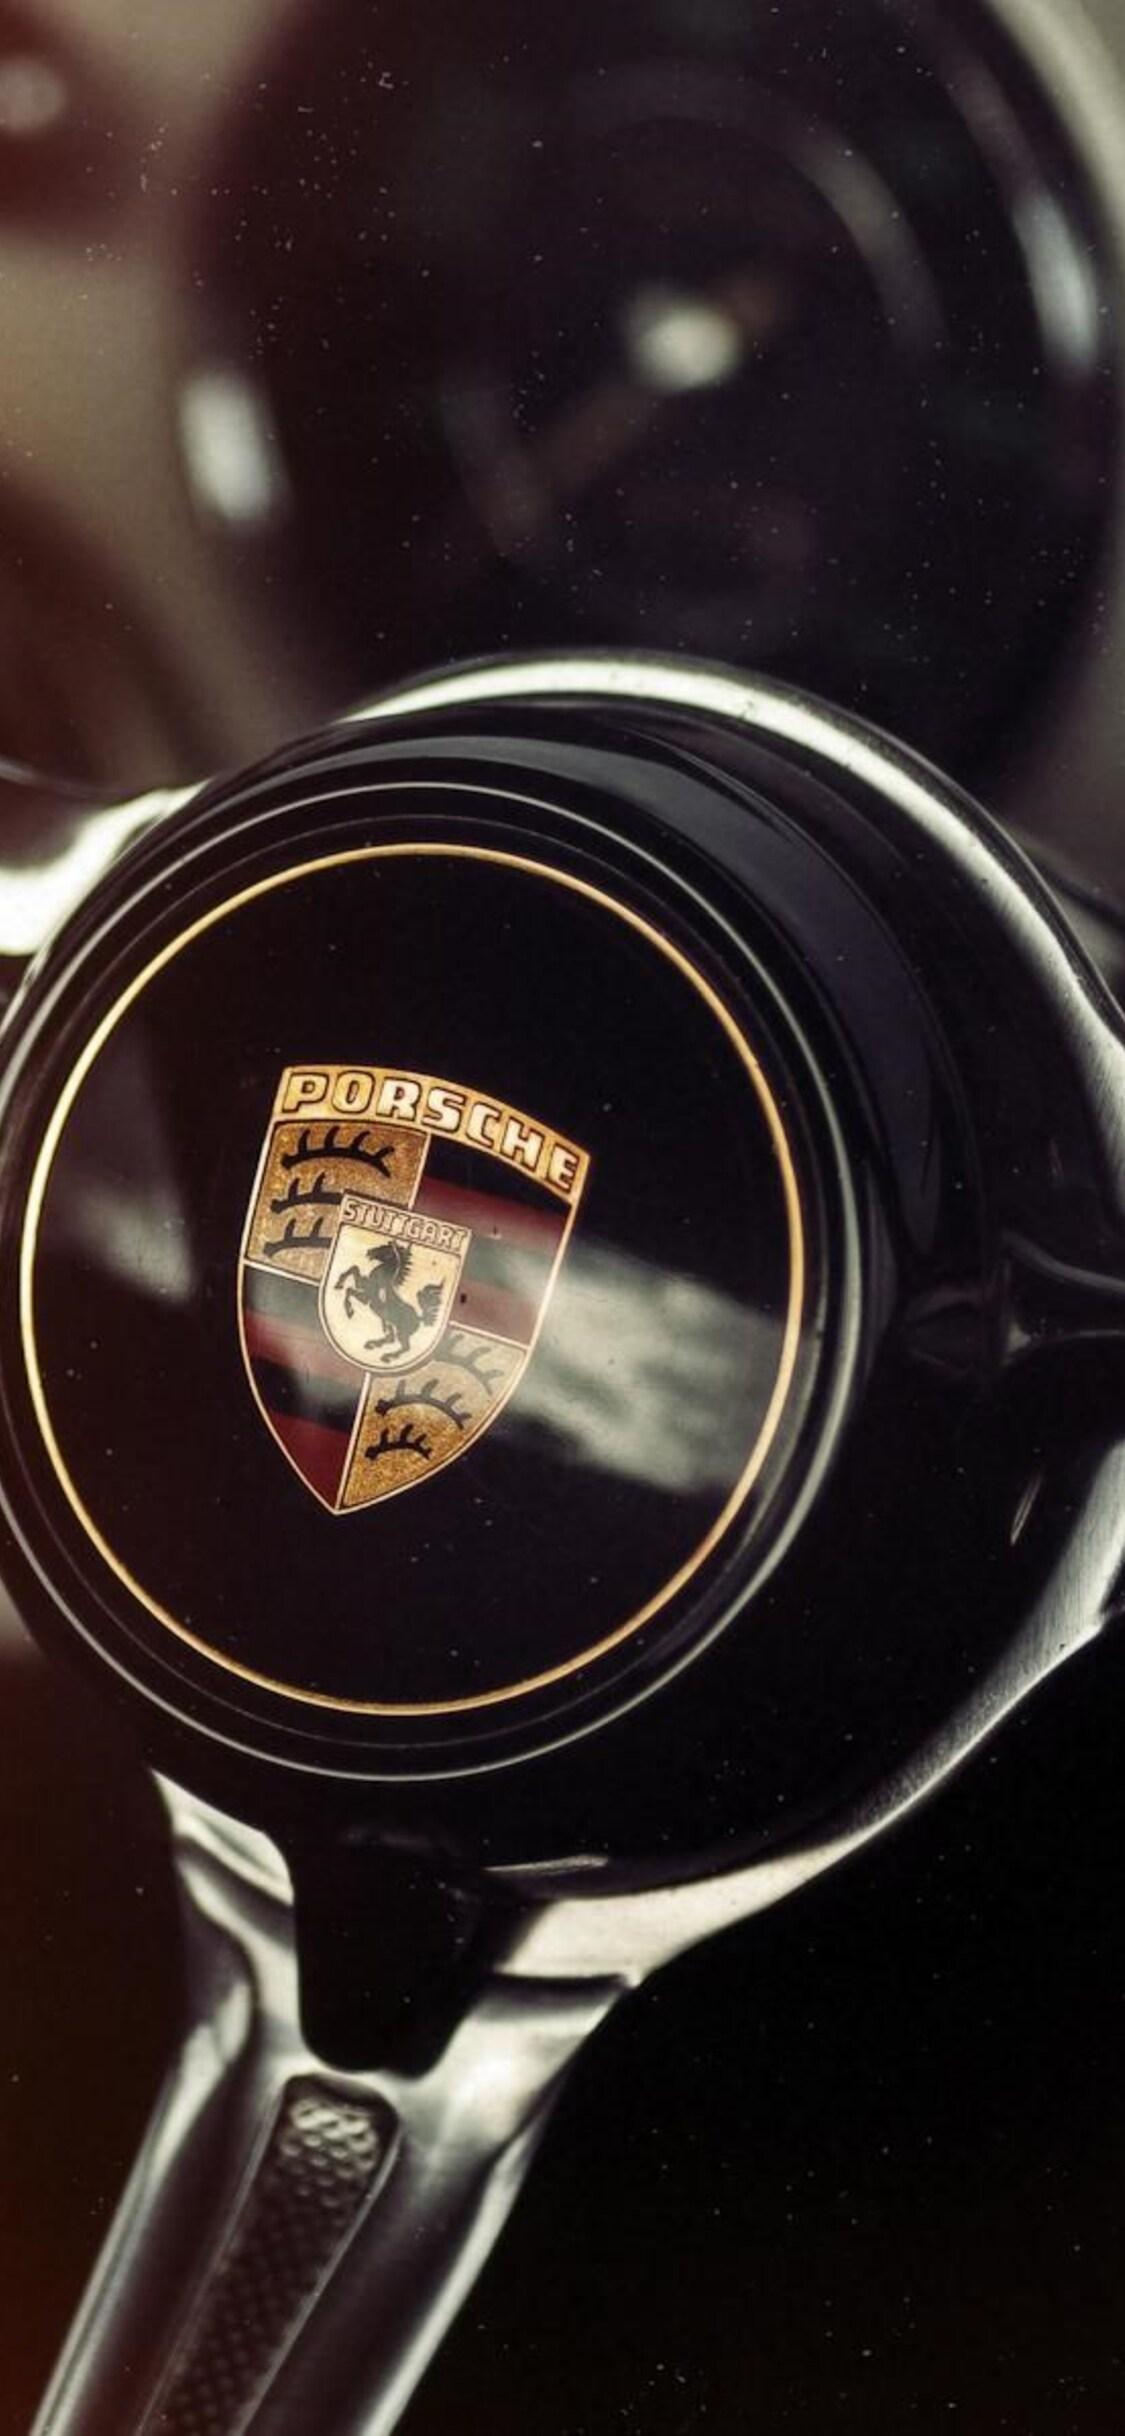 1125x2436 Porsche Car Steering Iphone Xs Iphone 10 Iphone X Hd 4k